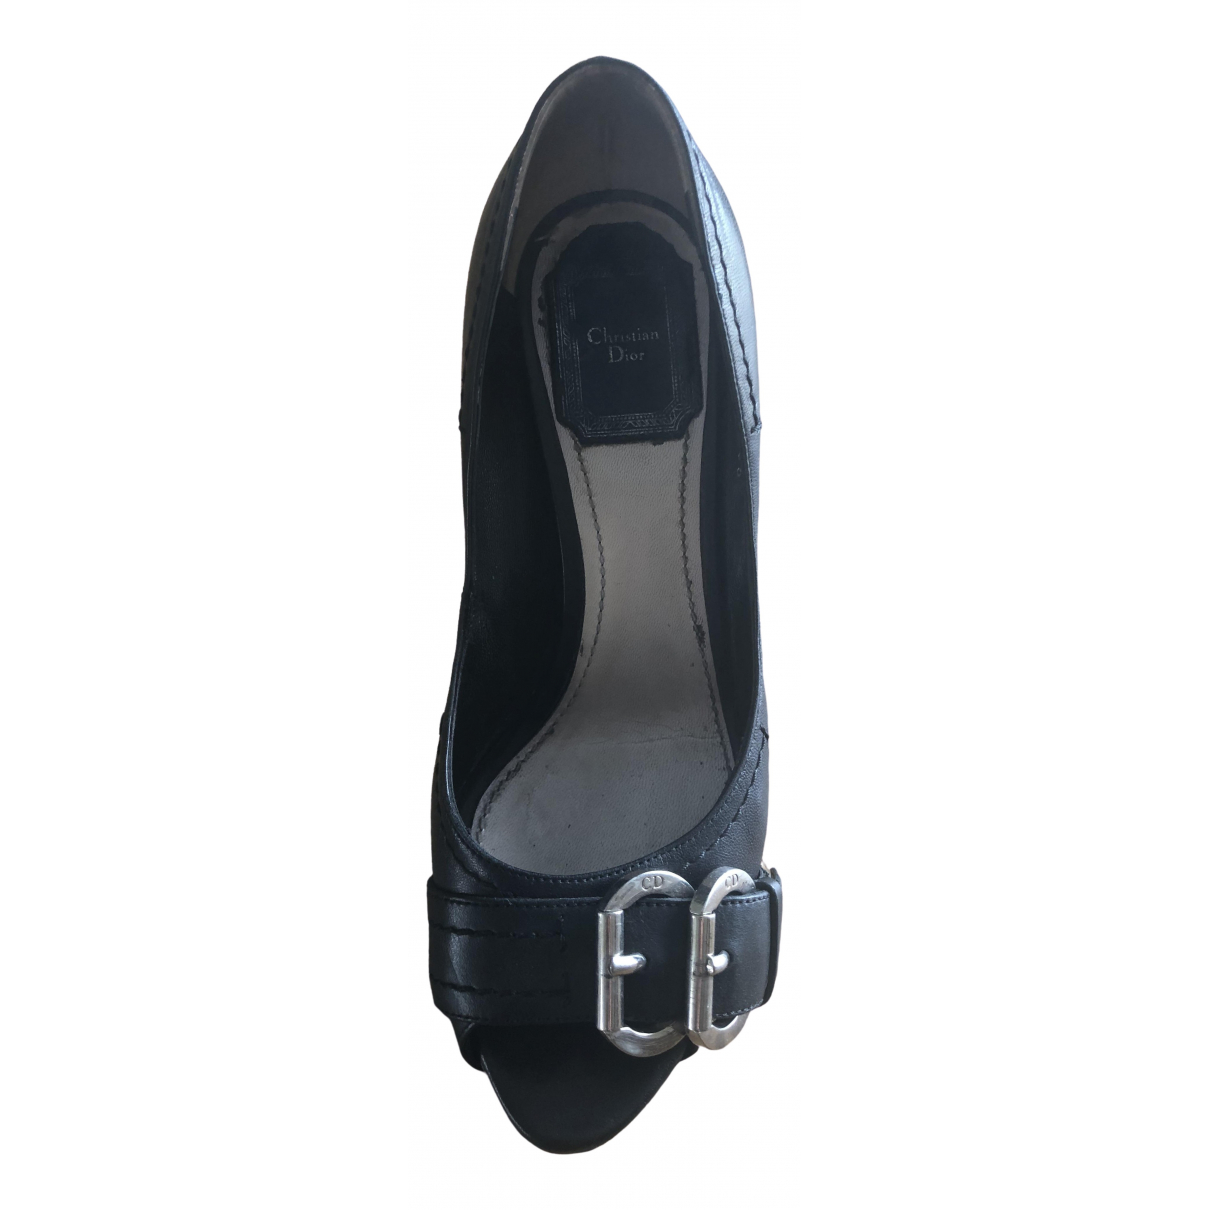 Dior \N Black Leather Heels for Women 36.5 EU